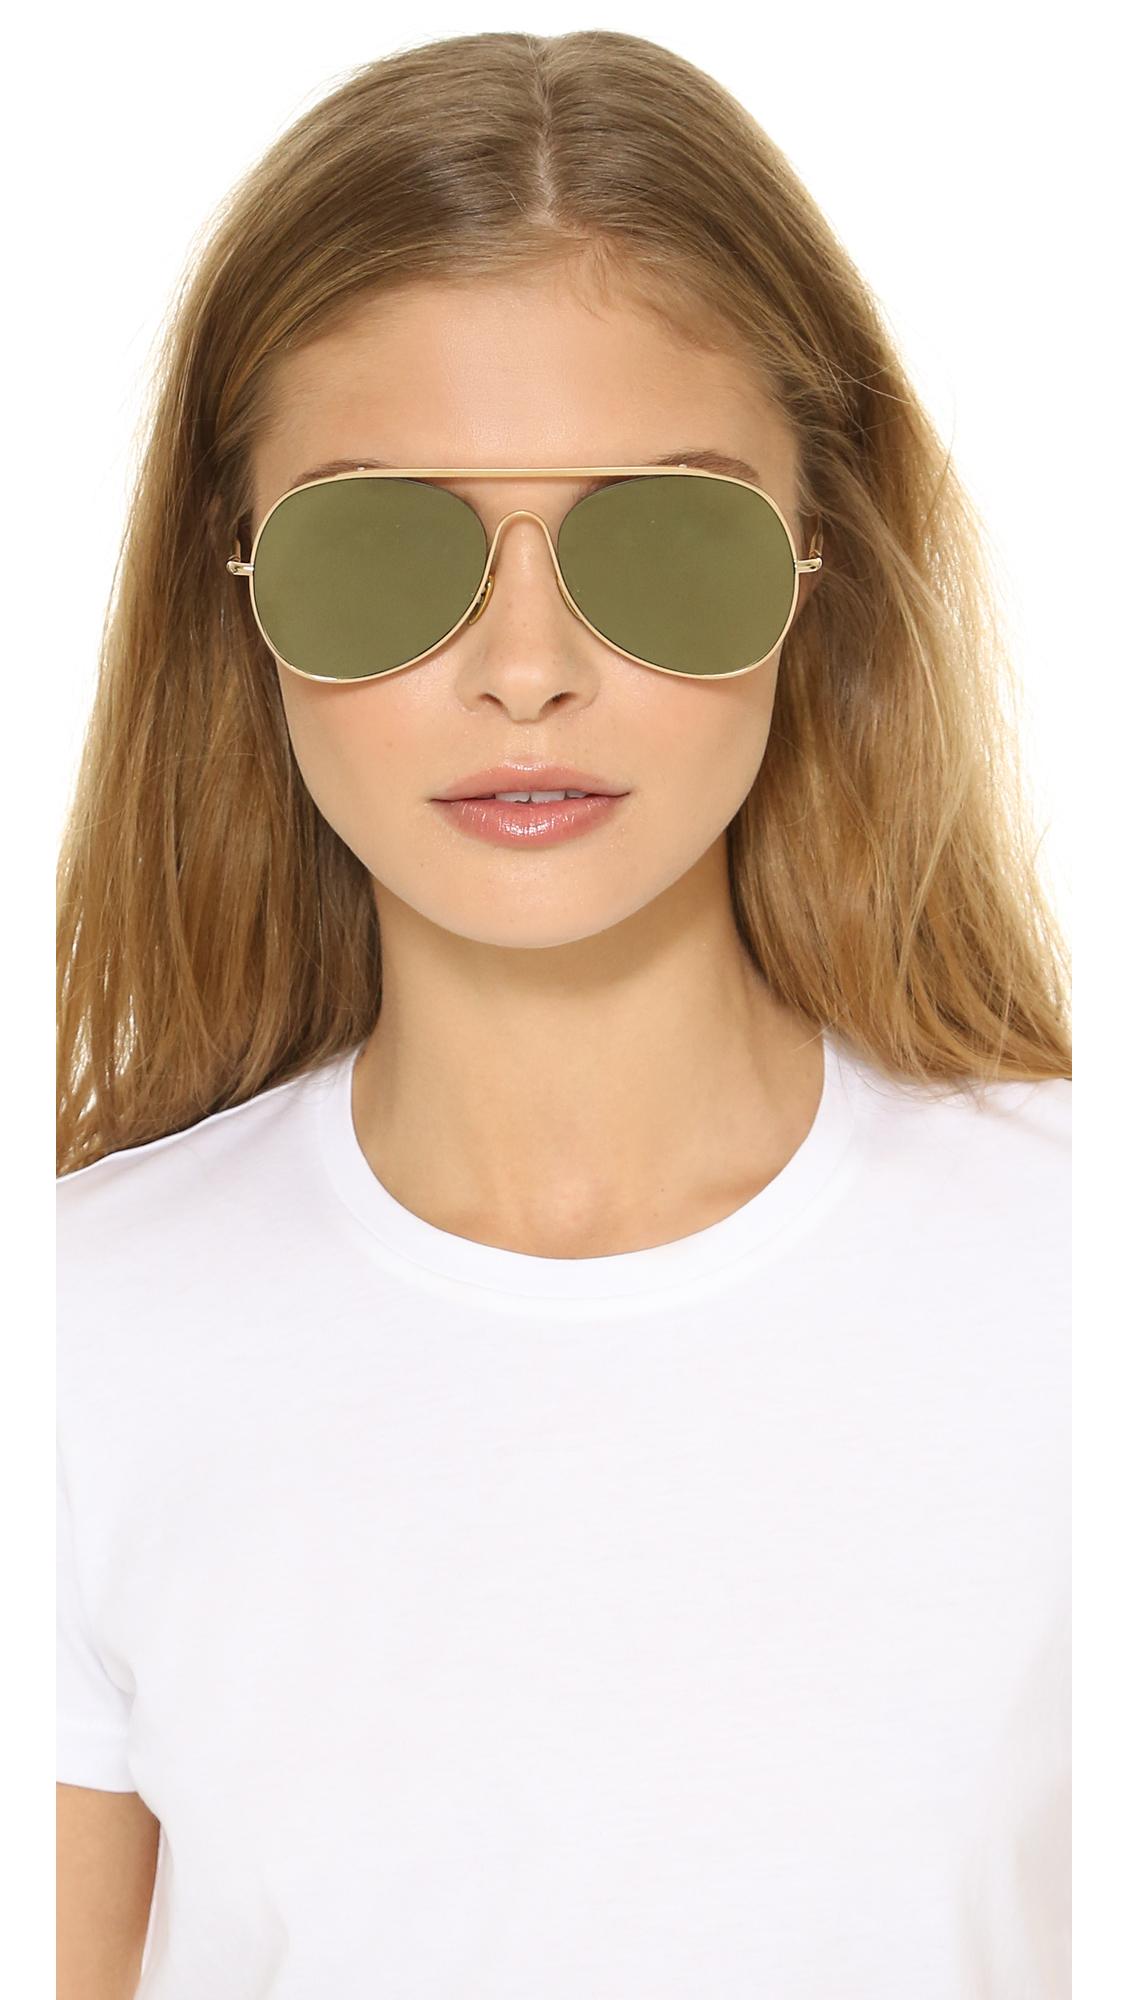 large aviator sunglasses  Acne studios Large Aviator Sunglasses - Palladium/silver Mirror in ...